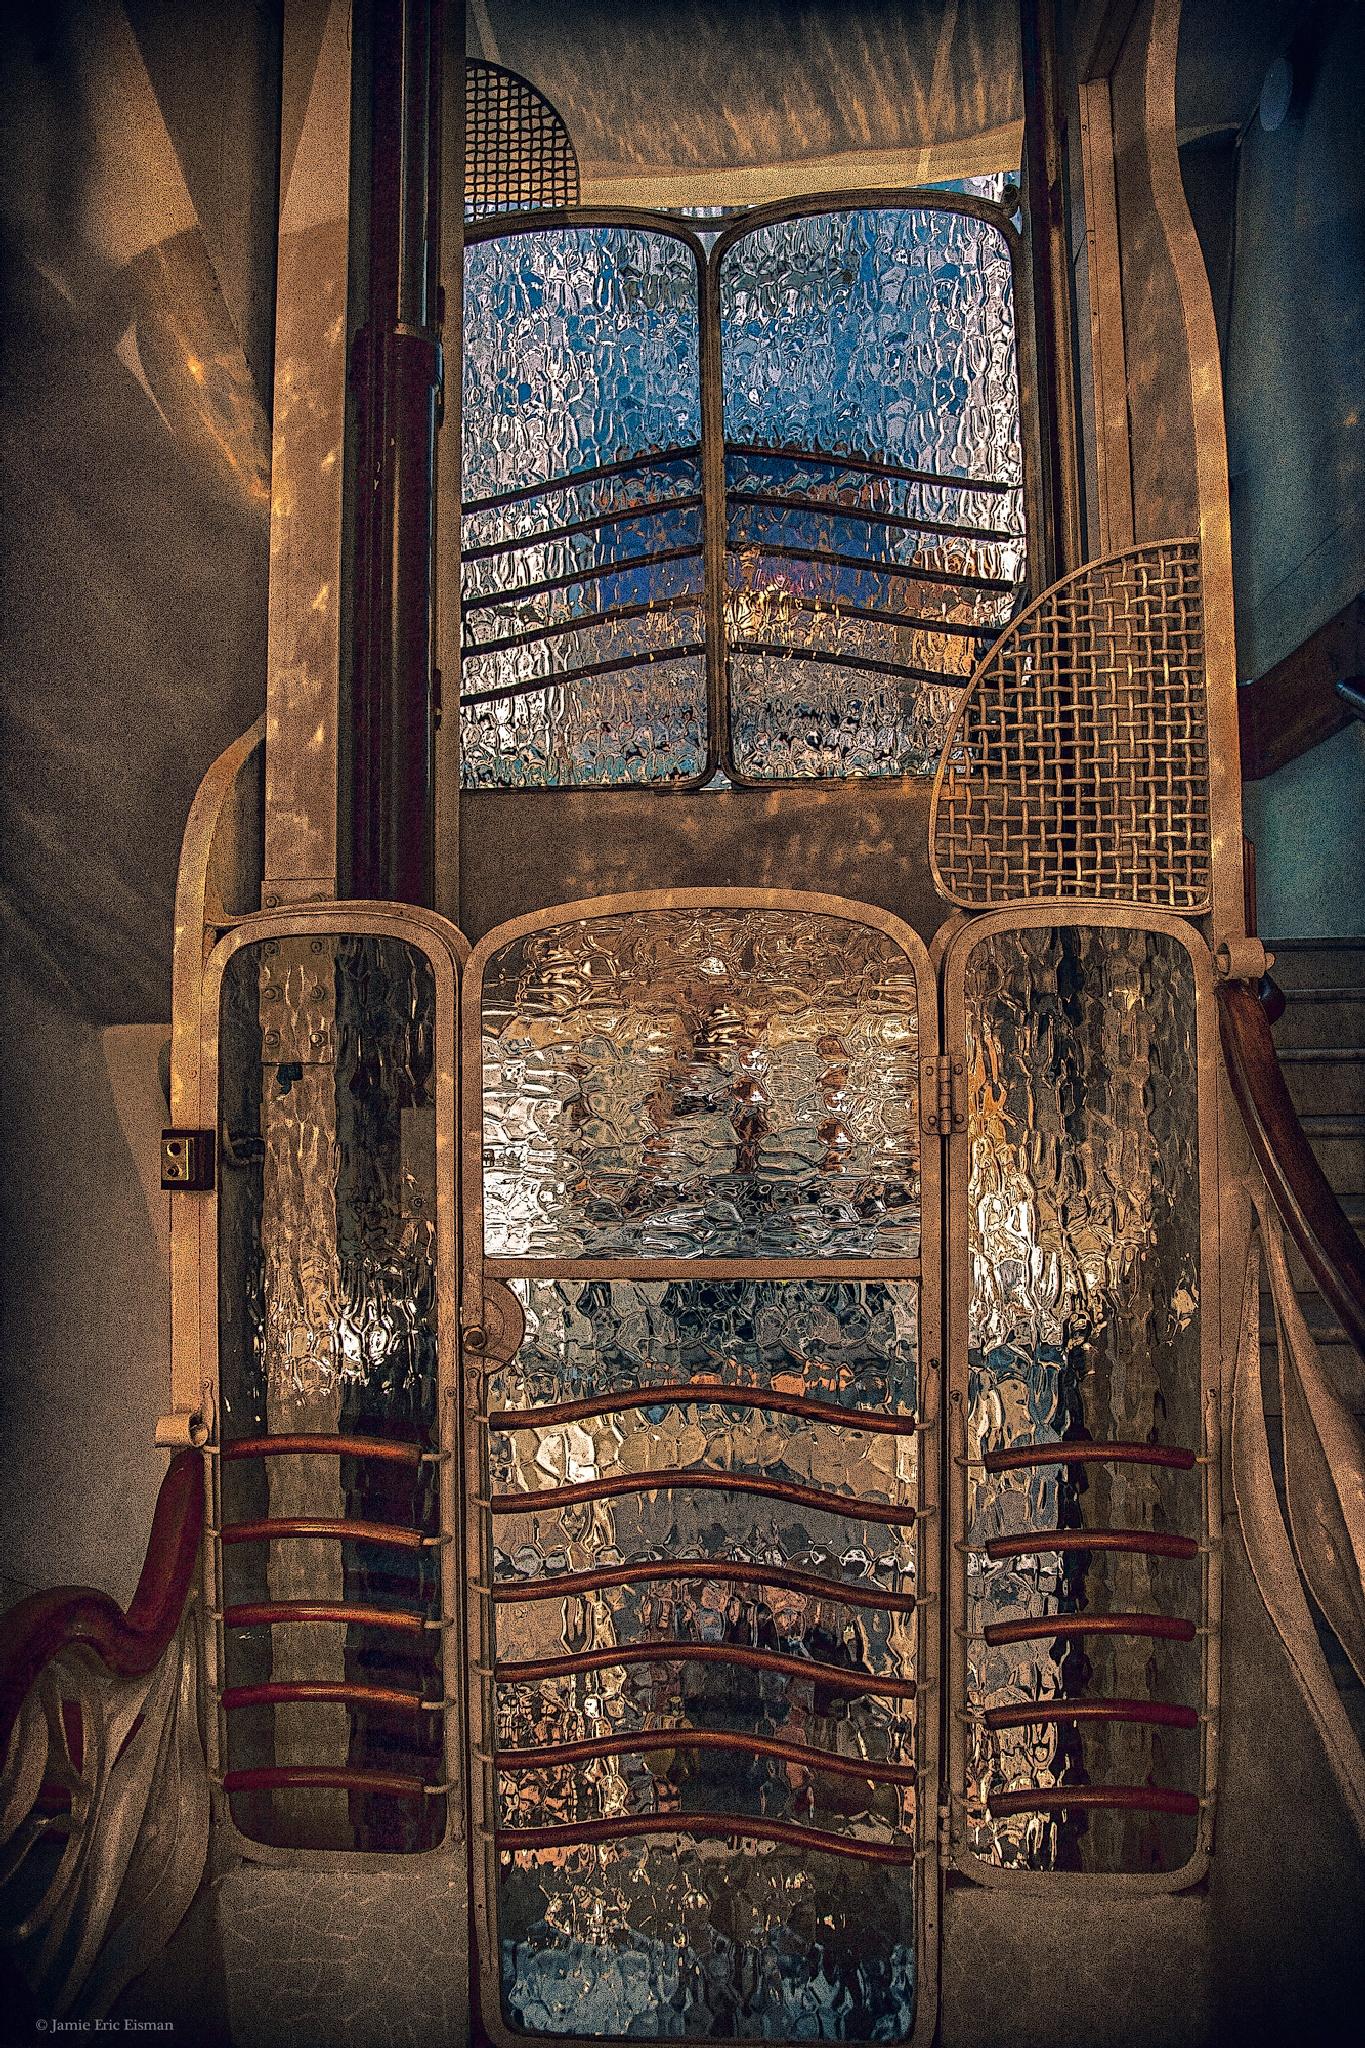 Elevator by Jamie Eric Eisman